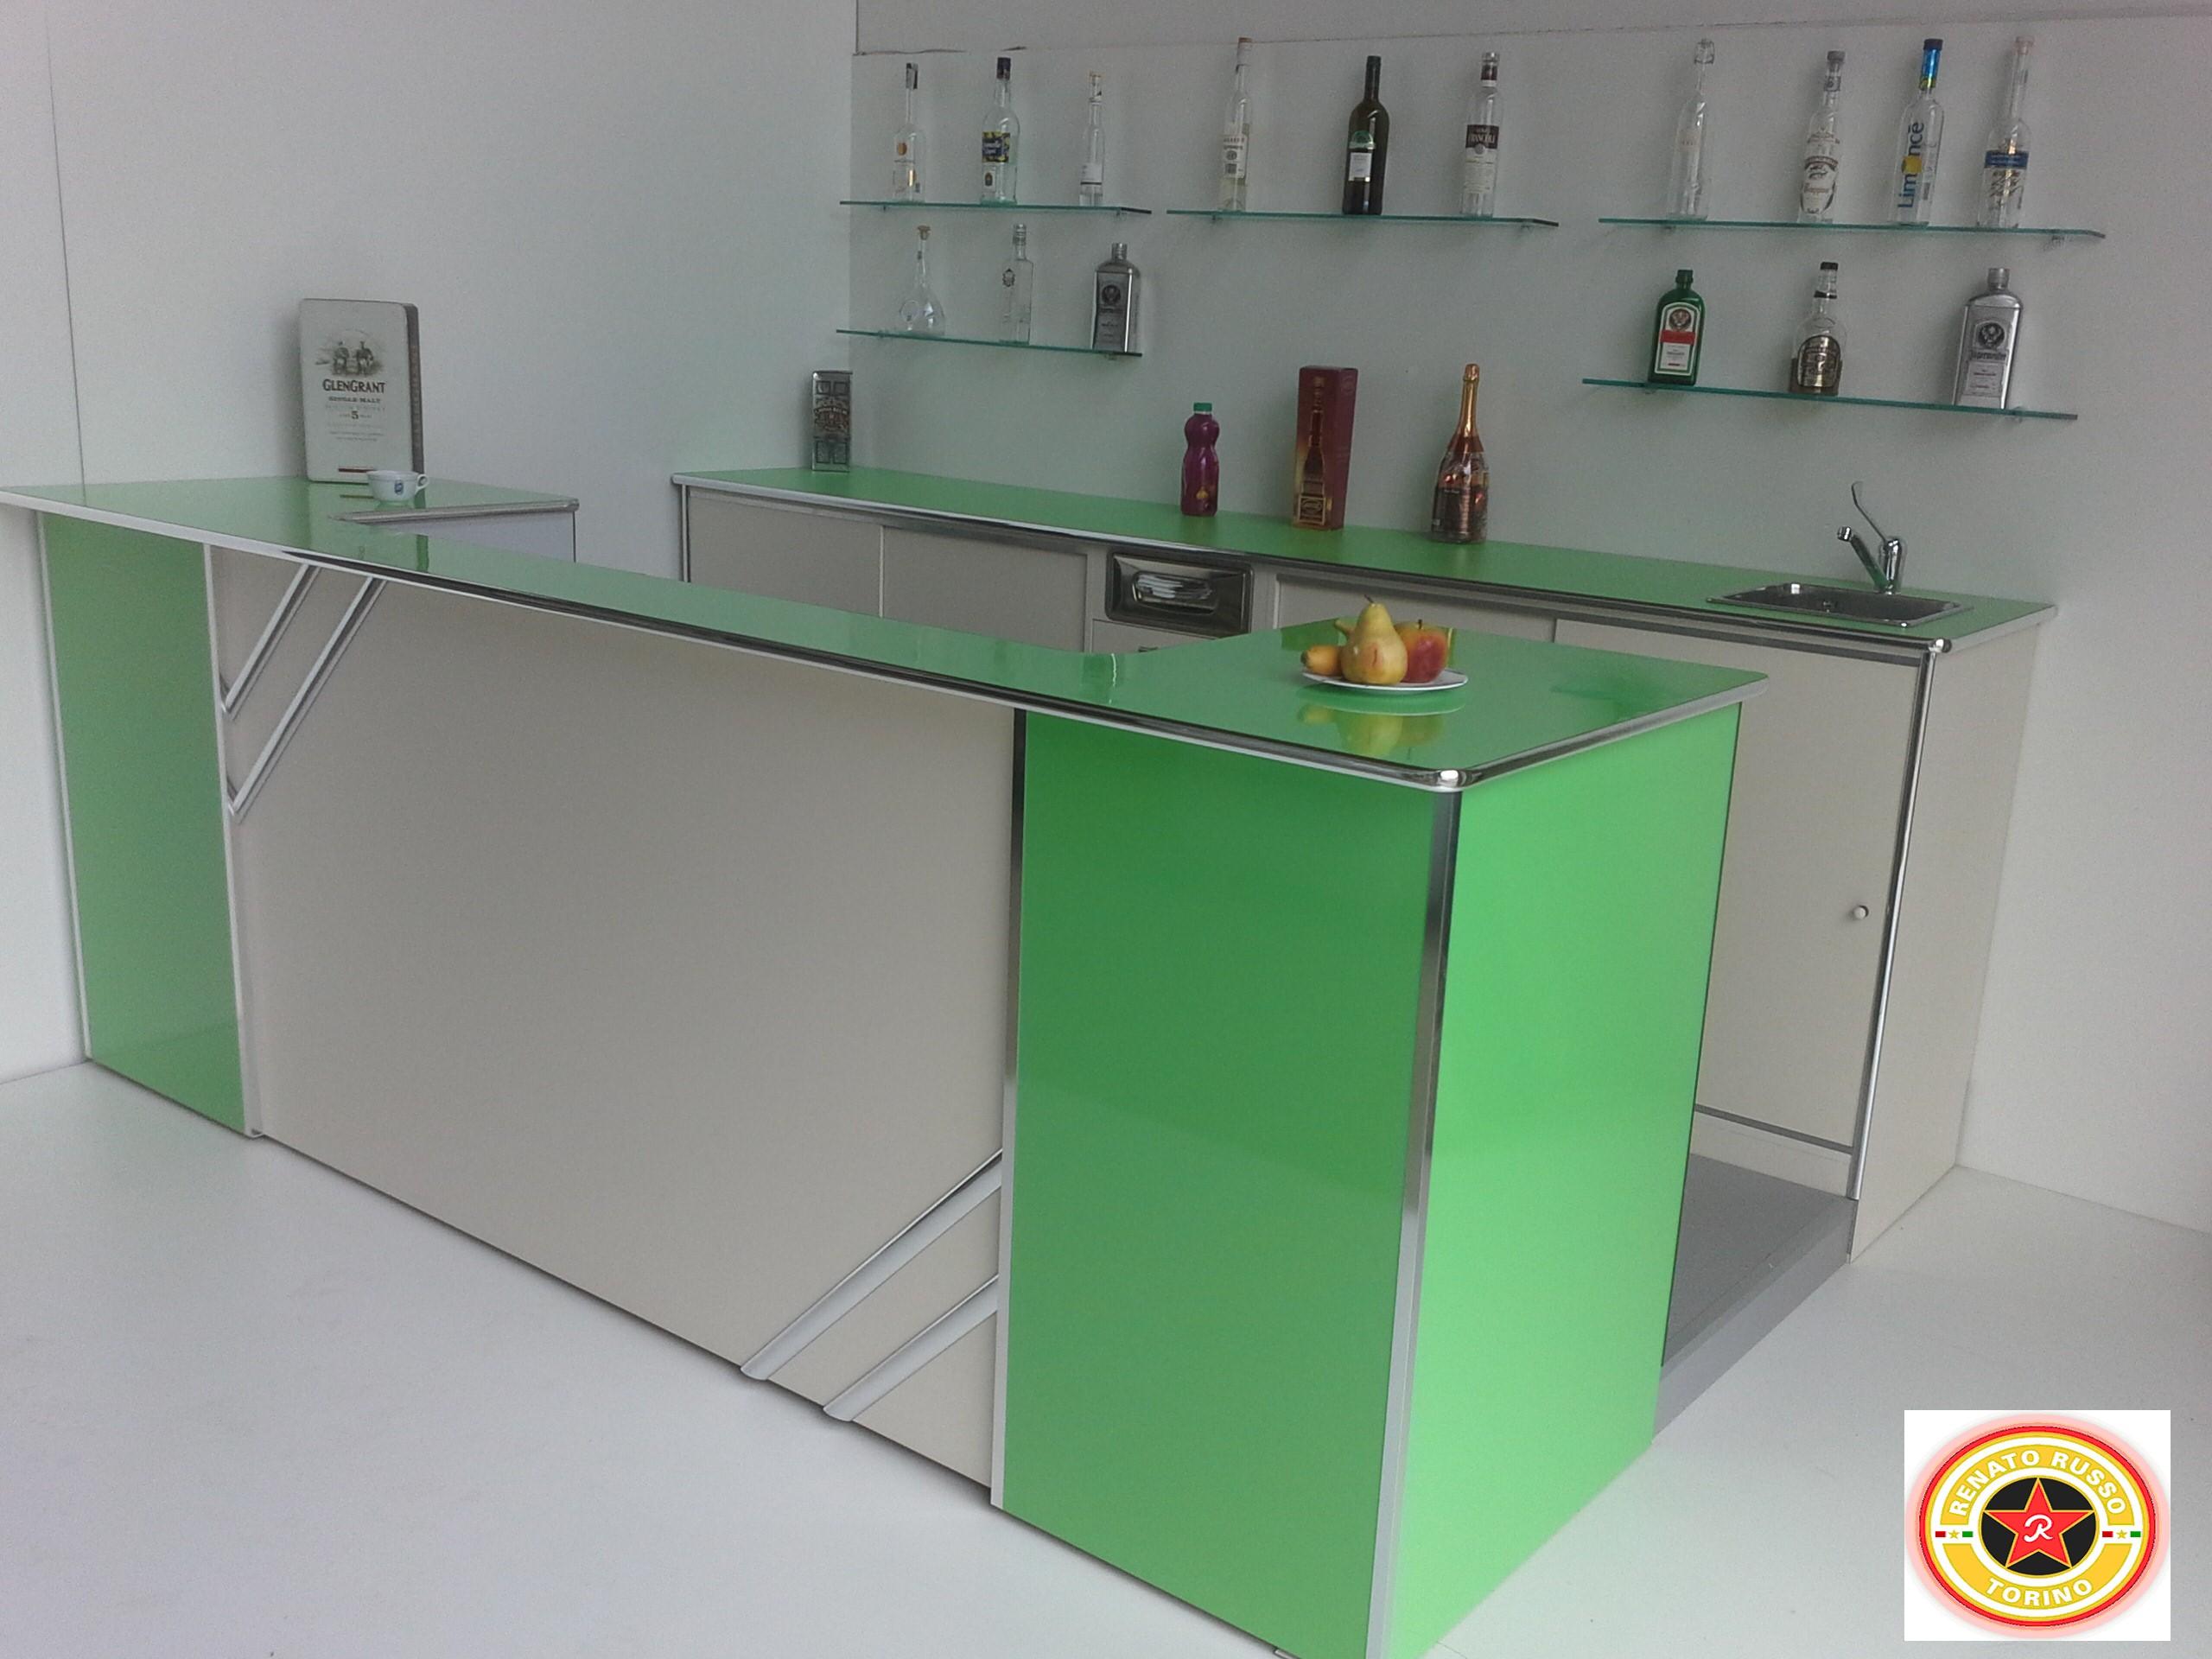 Banchi bar compra in fabbrica a met prezzo novit bar - Bar mobile usato ...